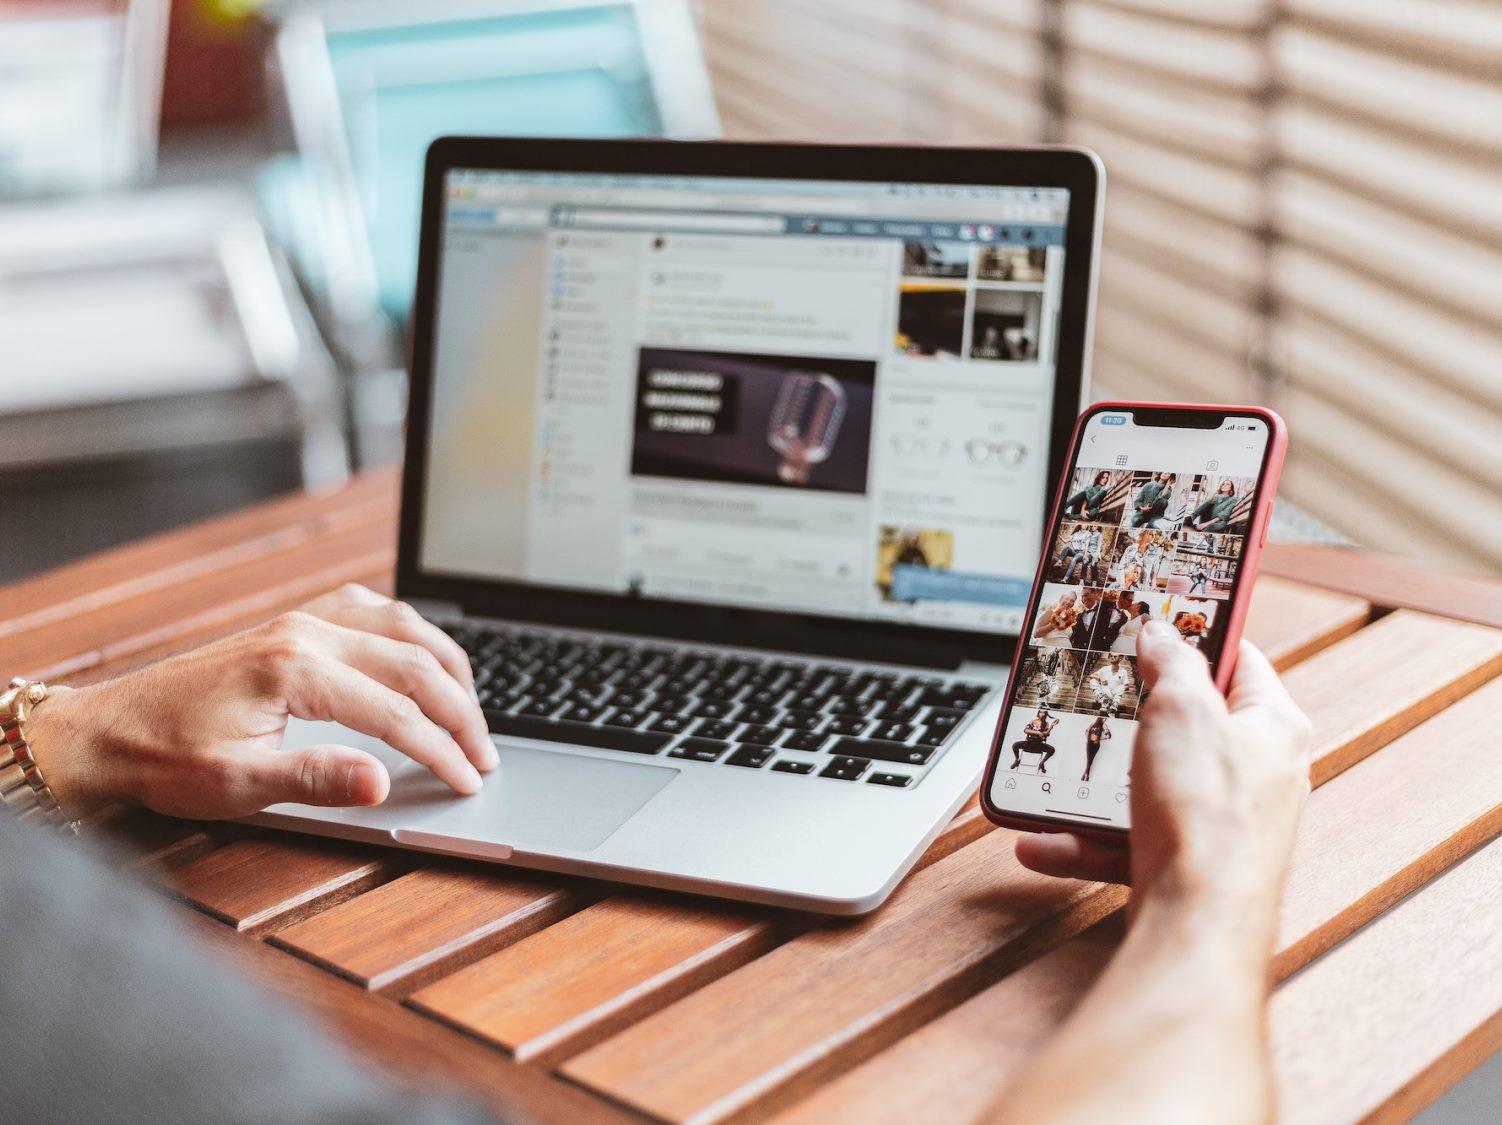 digital marketing in 2019, digital marketing in 2020